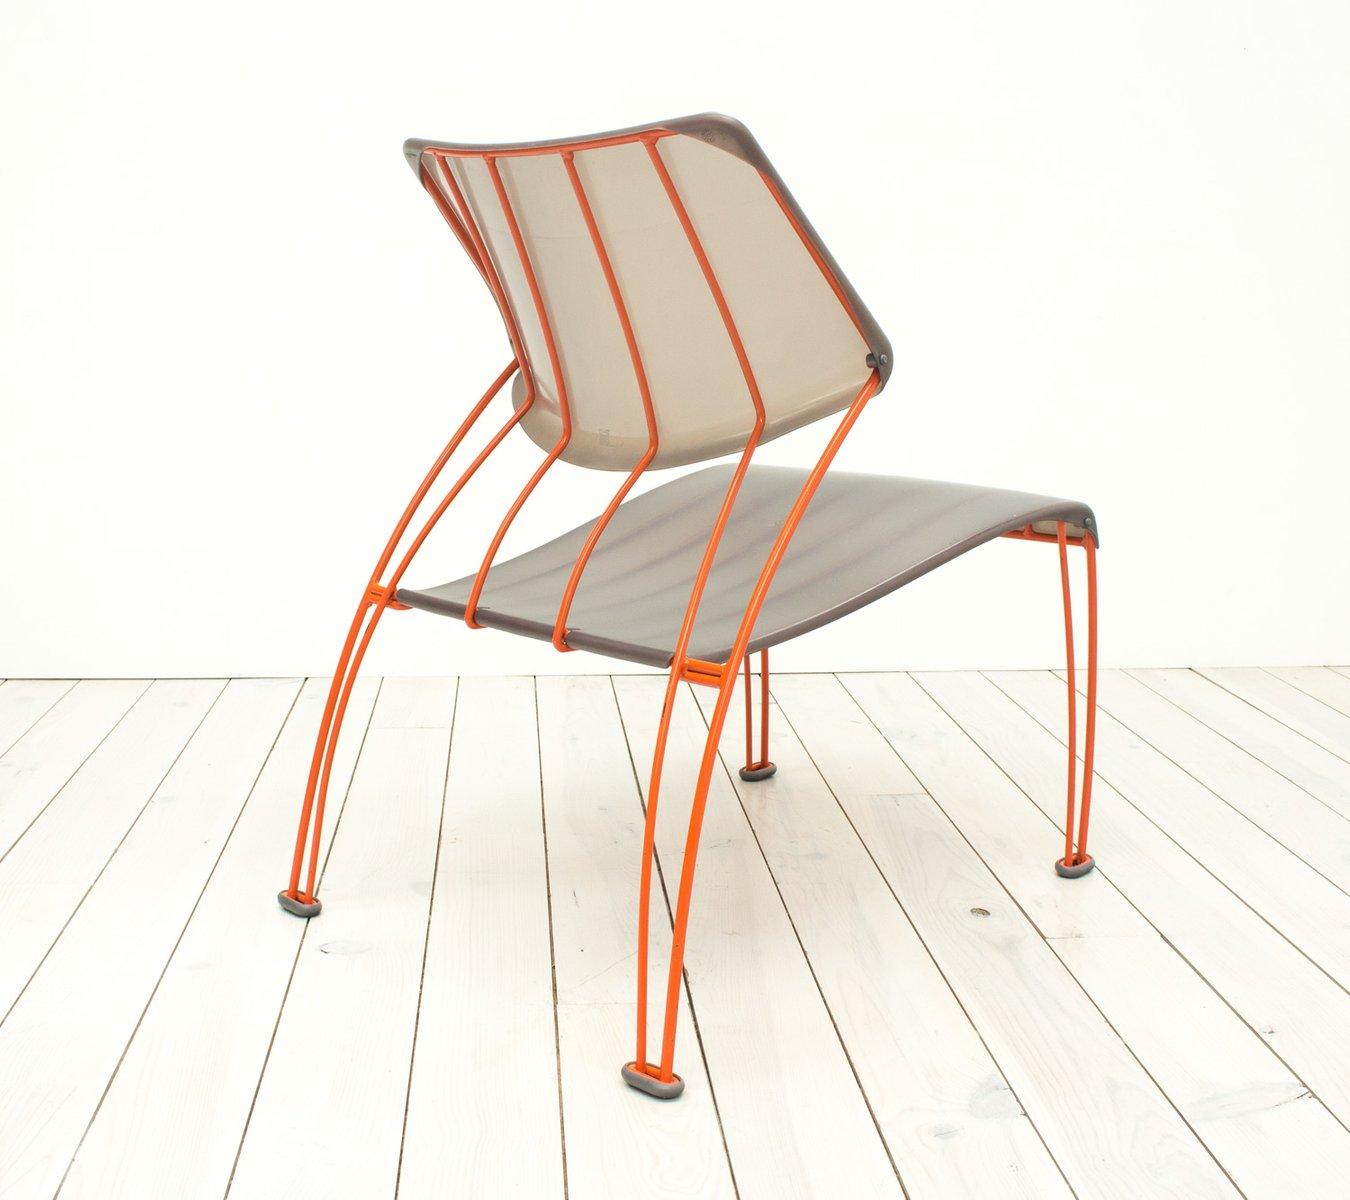 ikea tobias chair review slipcover for armless slipper silla affordable regalo ordenador solo